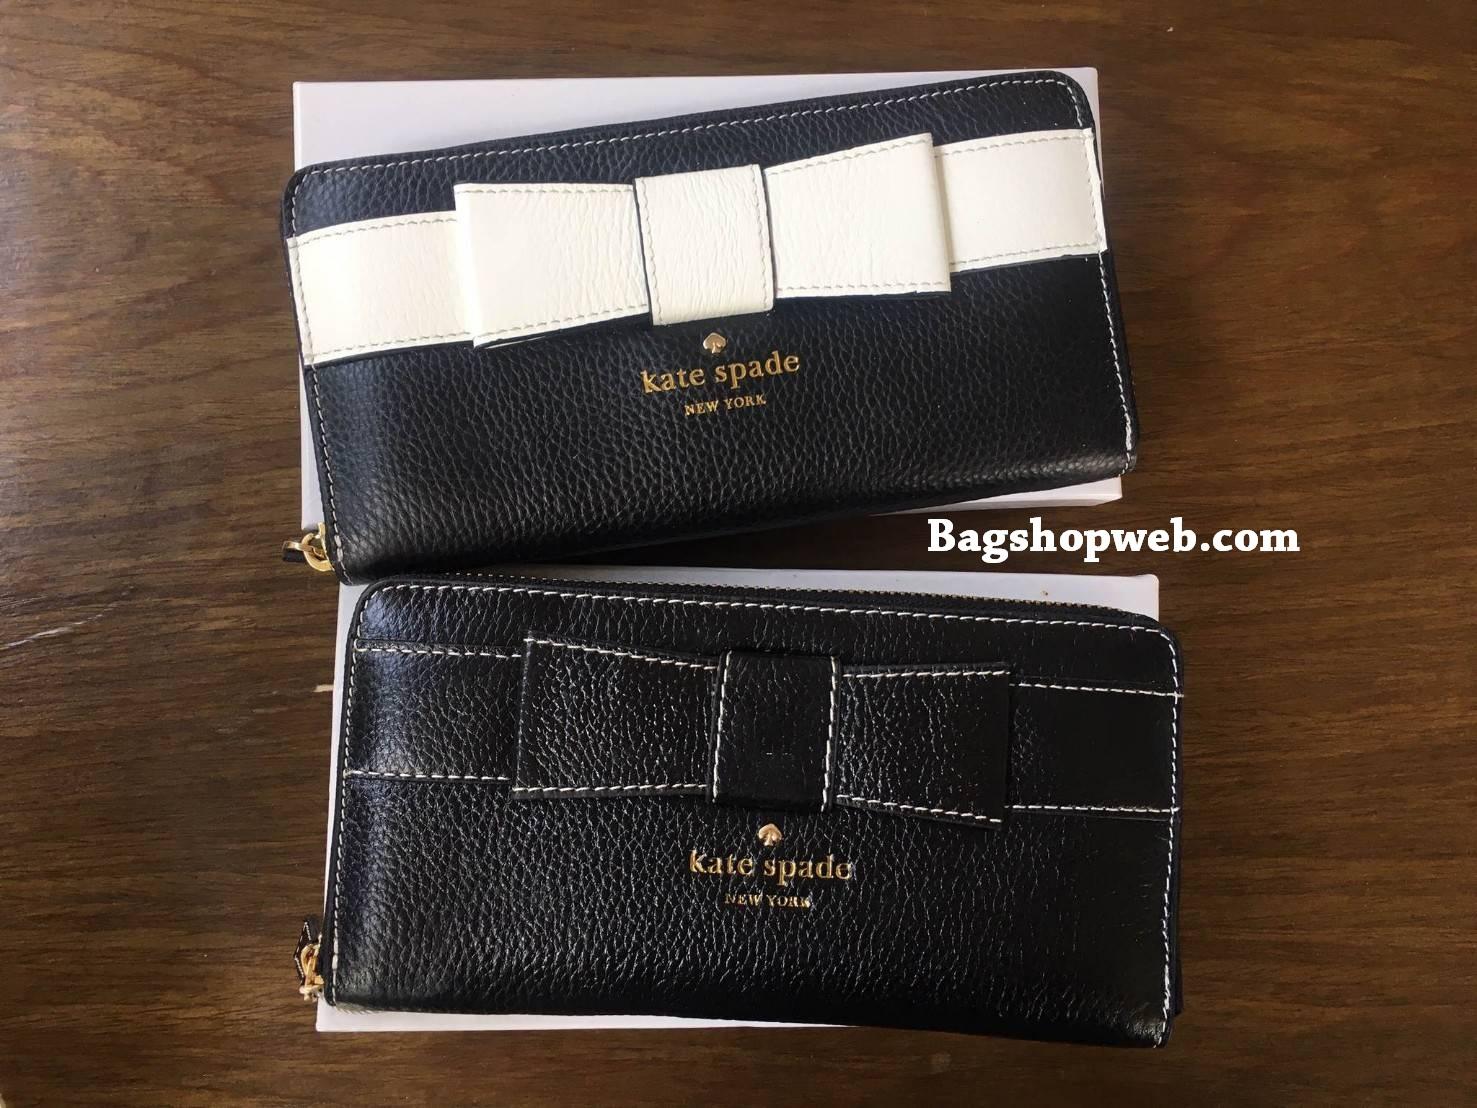 Kate Spade Women's Zip Wallet